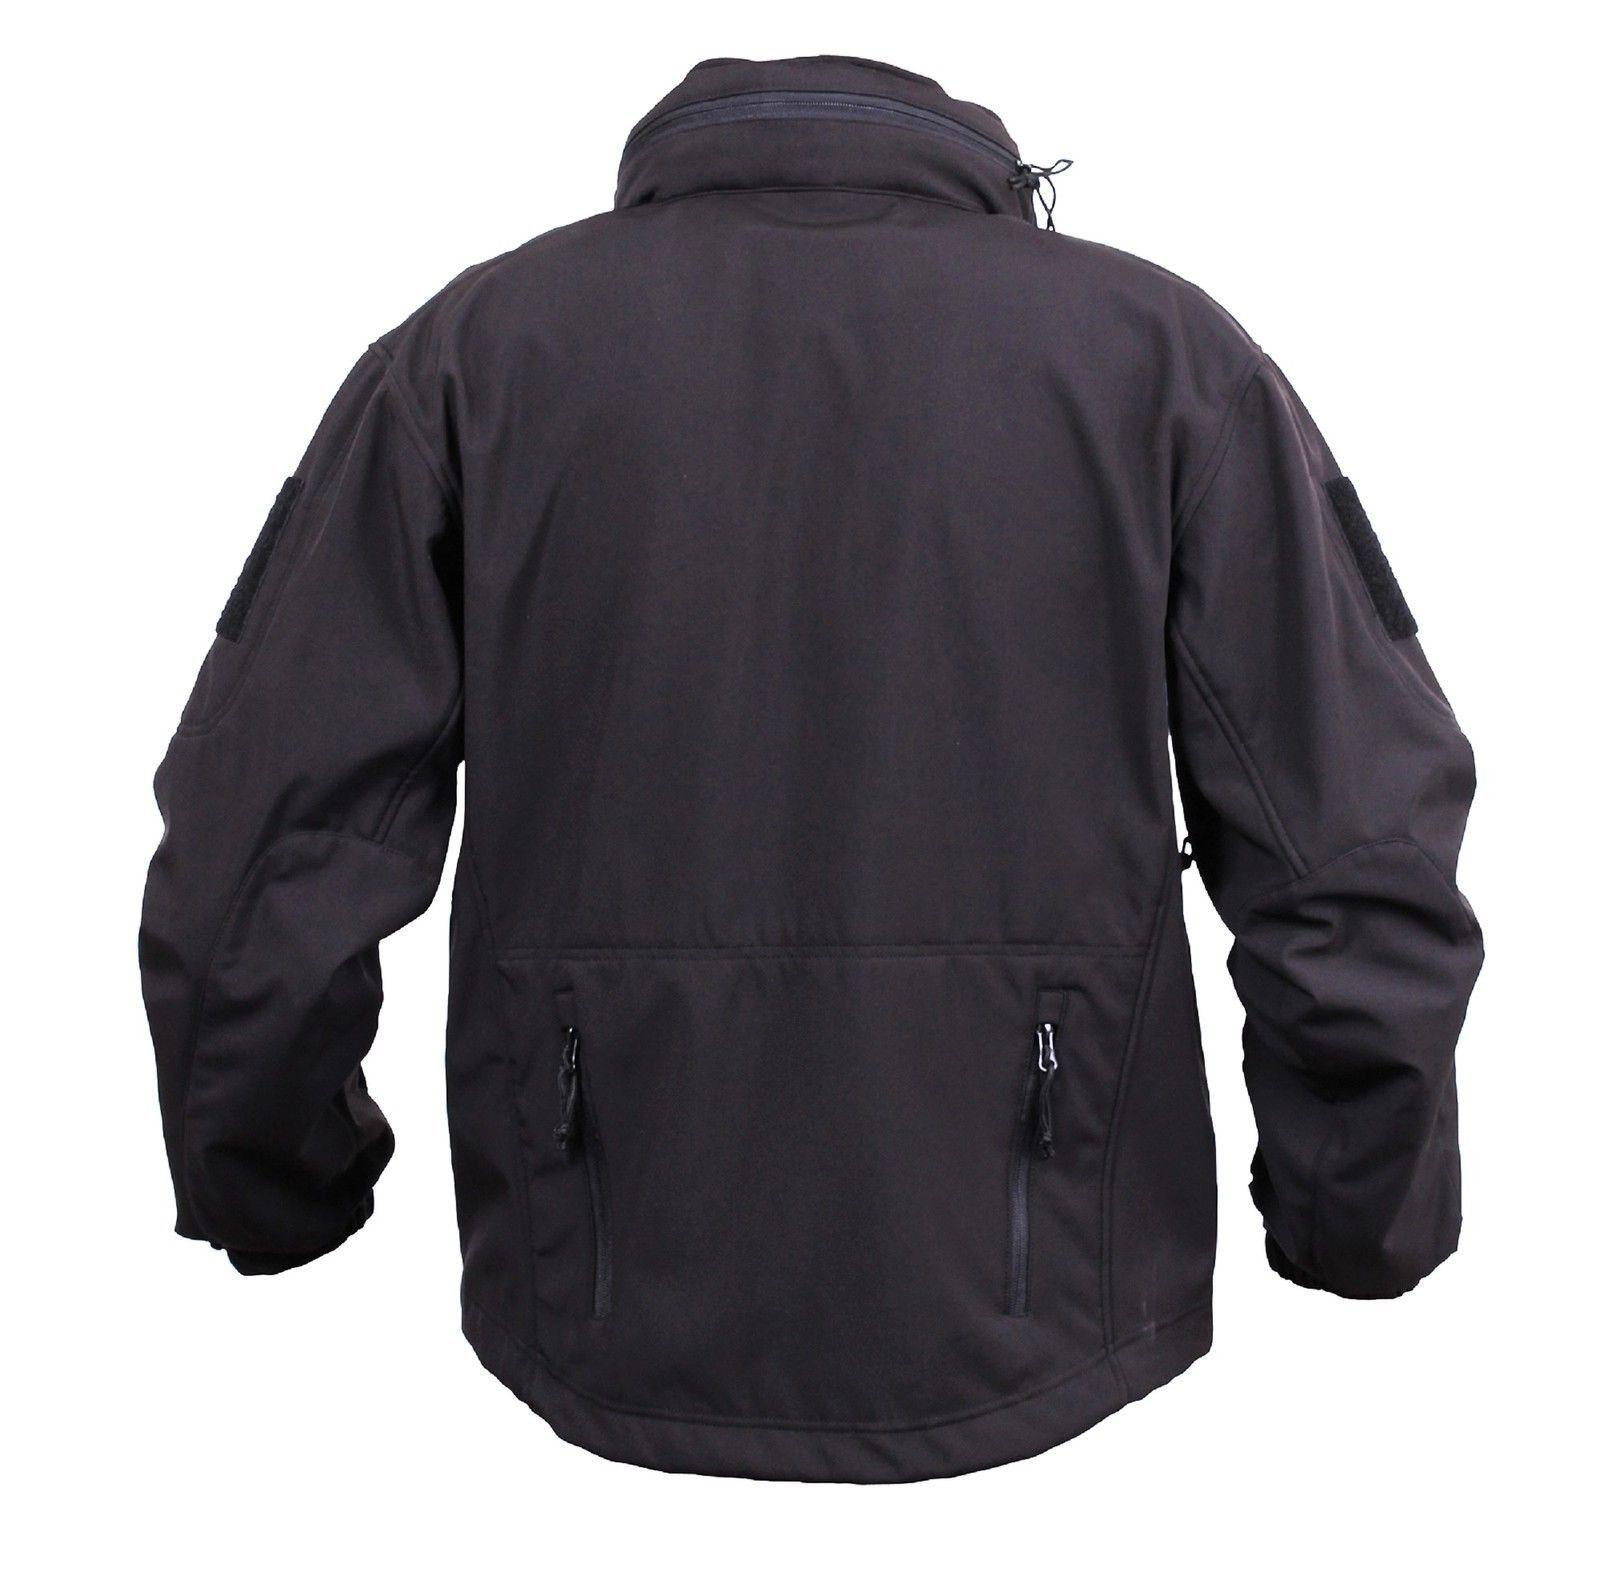 Men's Black Concealed Carry Soft S Tactical Jacket Waterproof ...